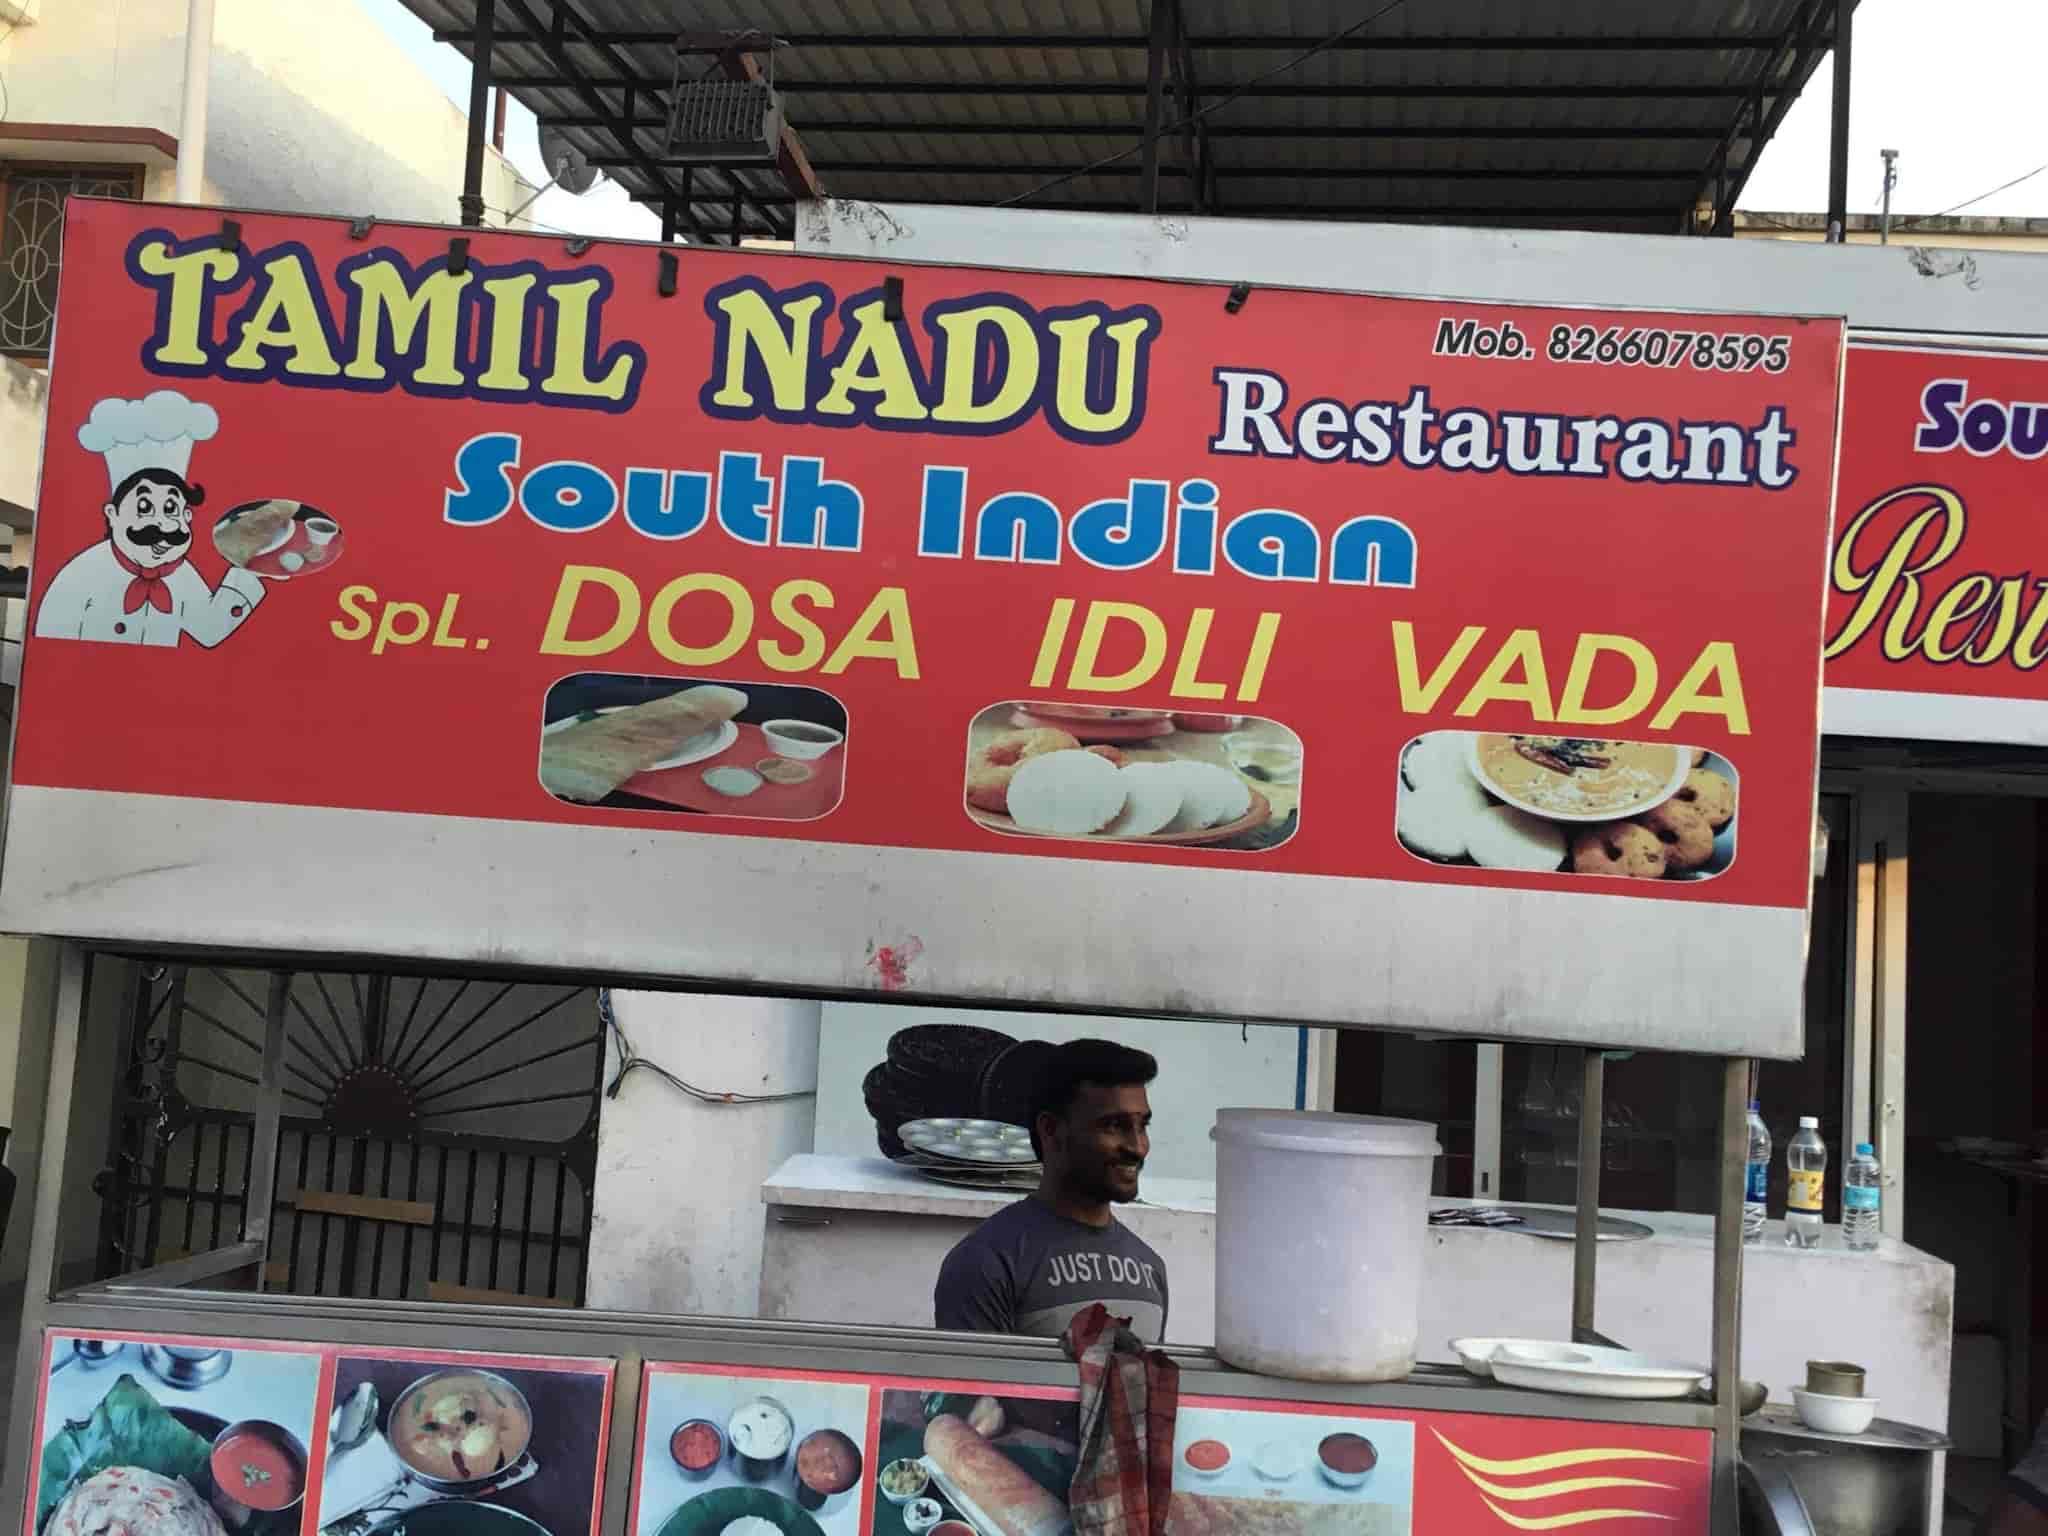 Tamil Nadu Restaurant Photos Prem Nagar Dehradun Restaurants